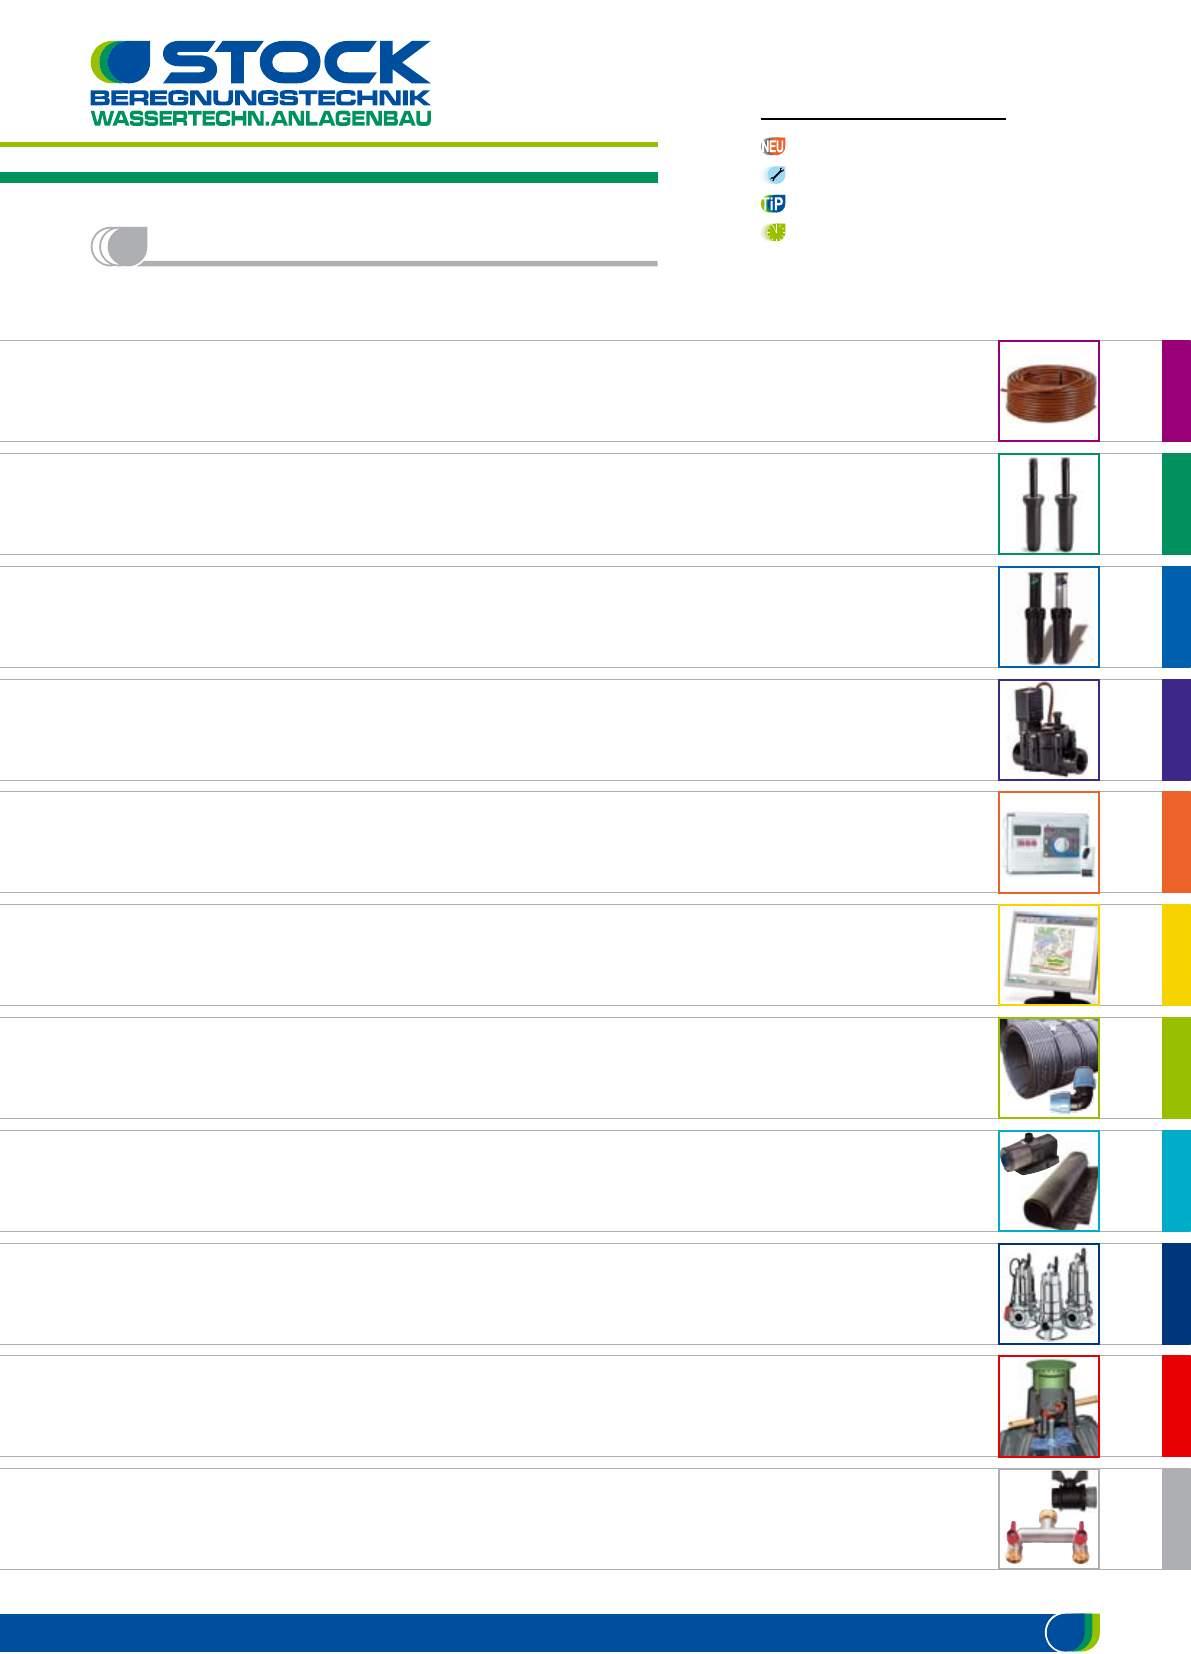 Garten Und Landschaftsbau Preisliste Elegant Stock Preiskatalog 2011 [pdf Document]